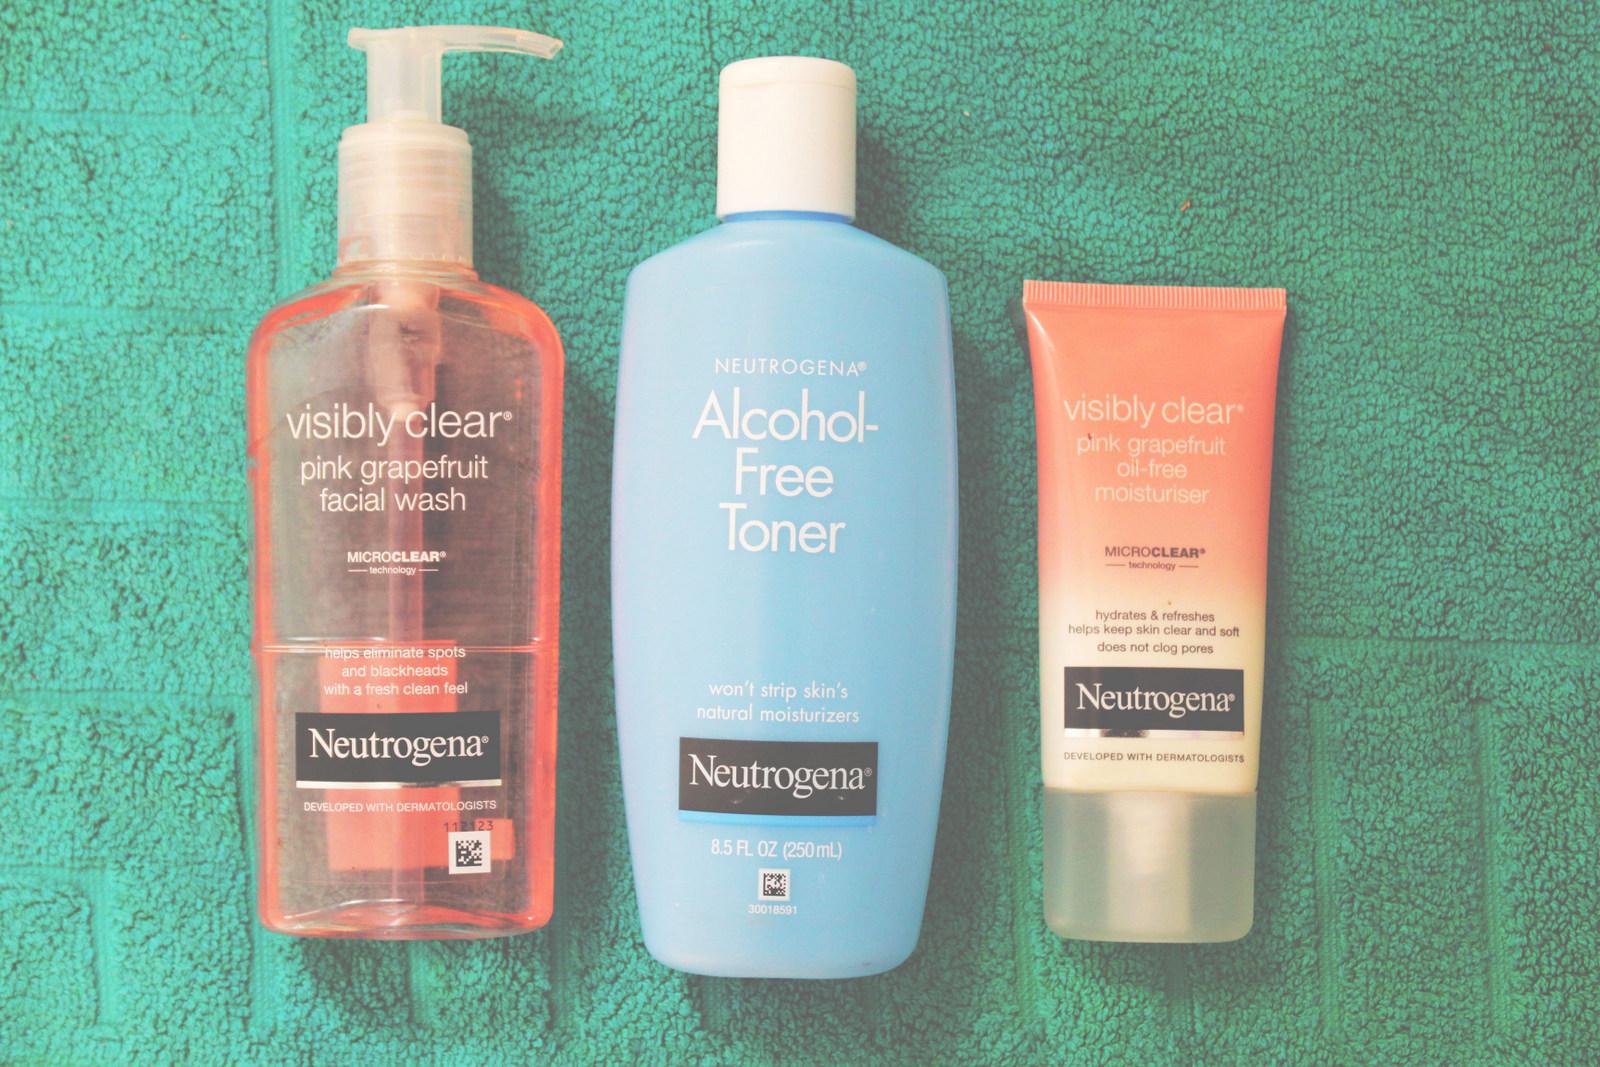 Neutrogena facial wash, toner and moisturizer.